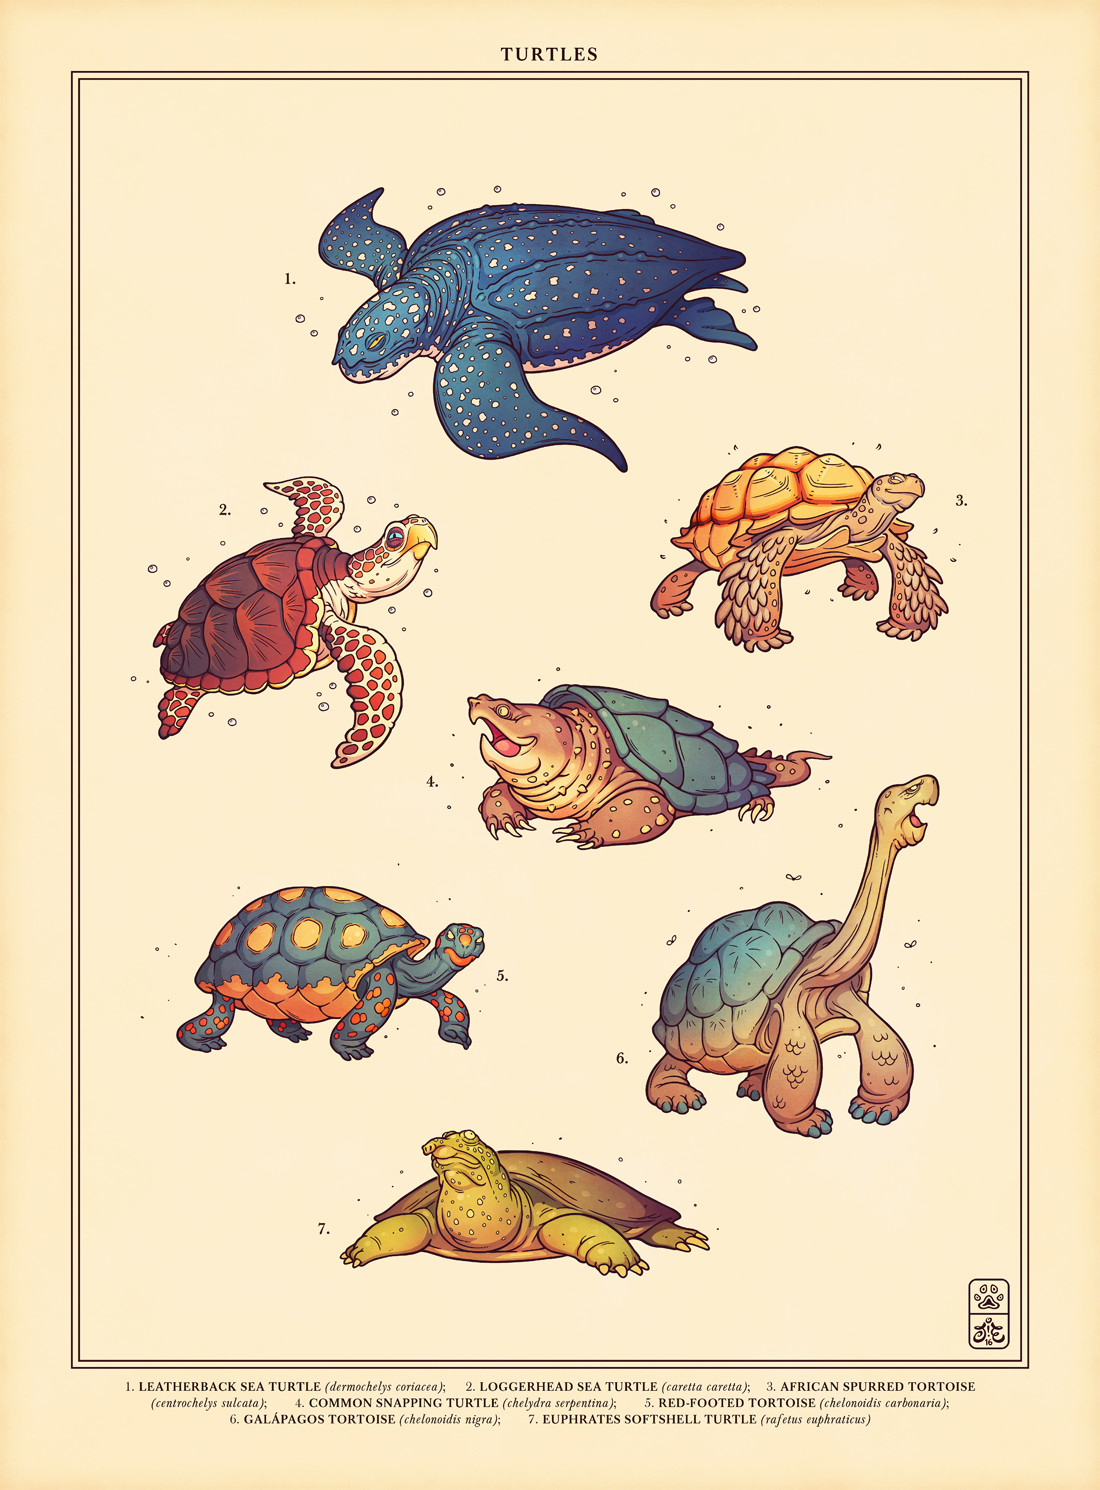 Jonatan iversen ejve turtles1